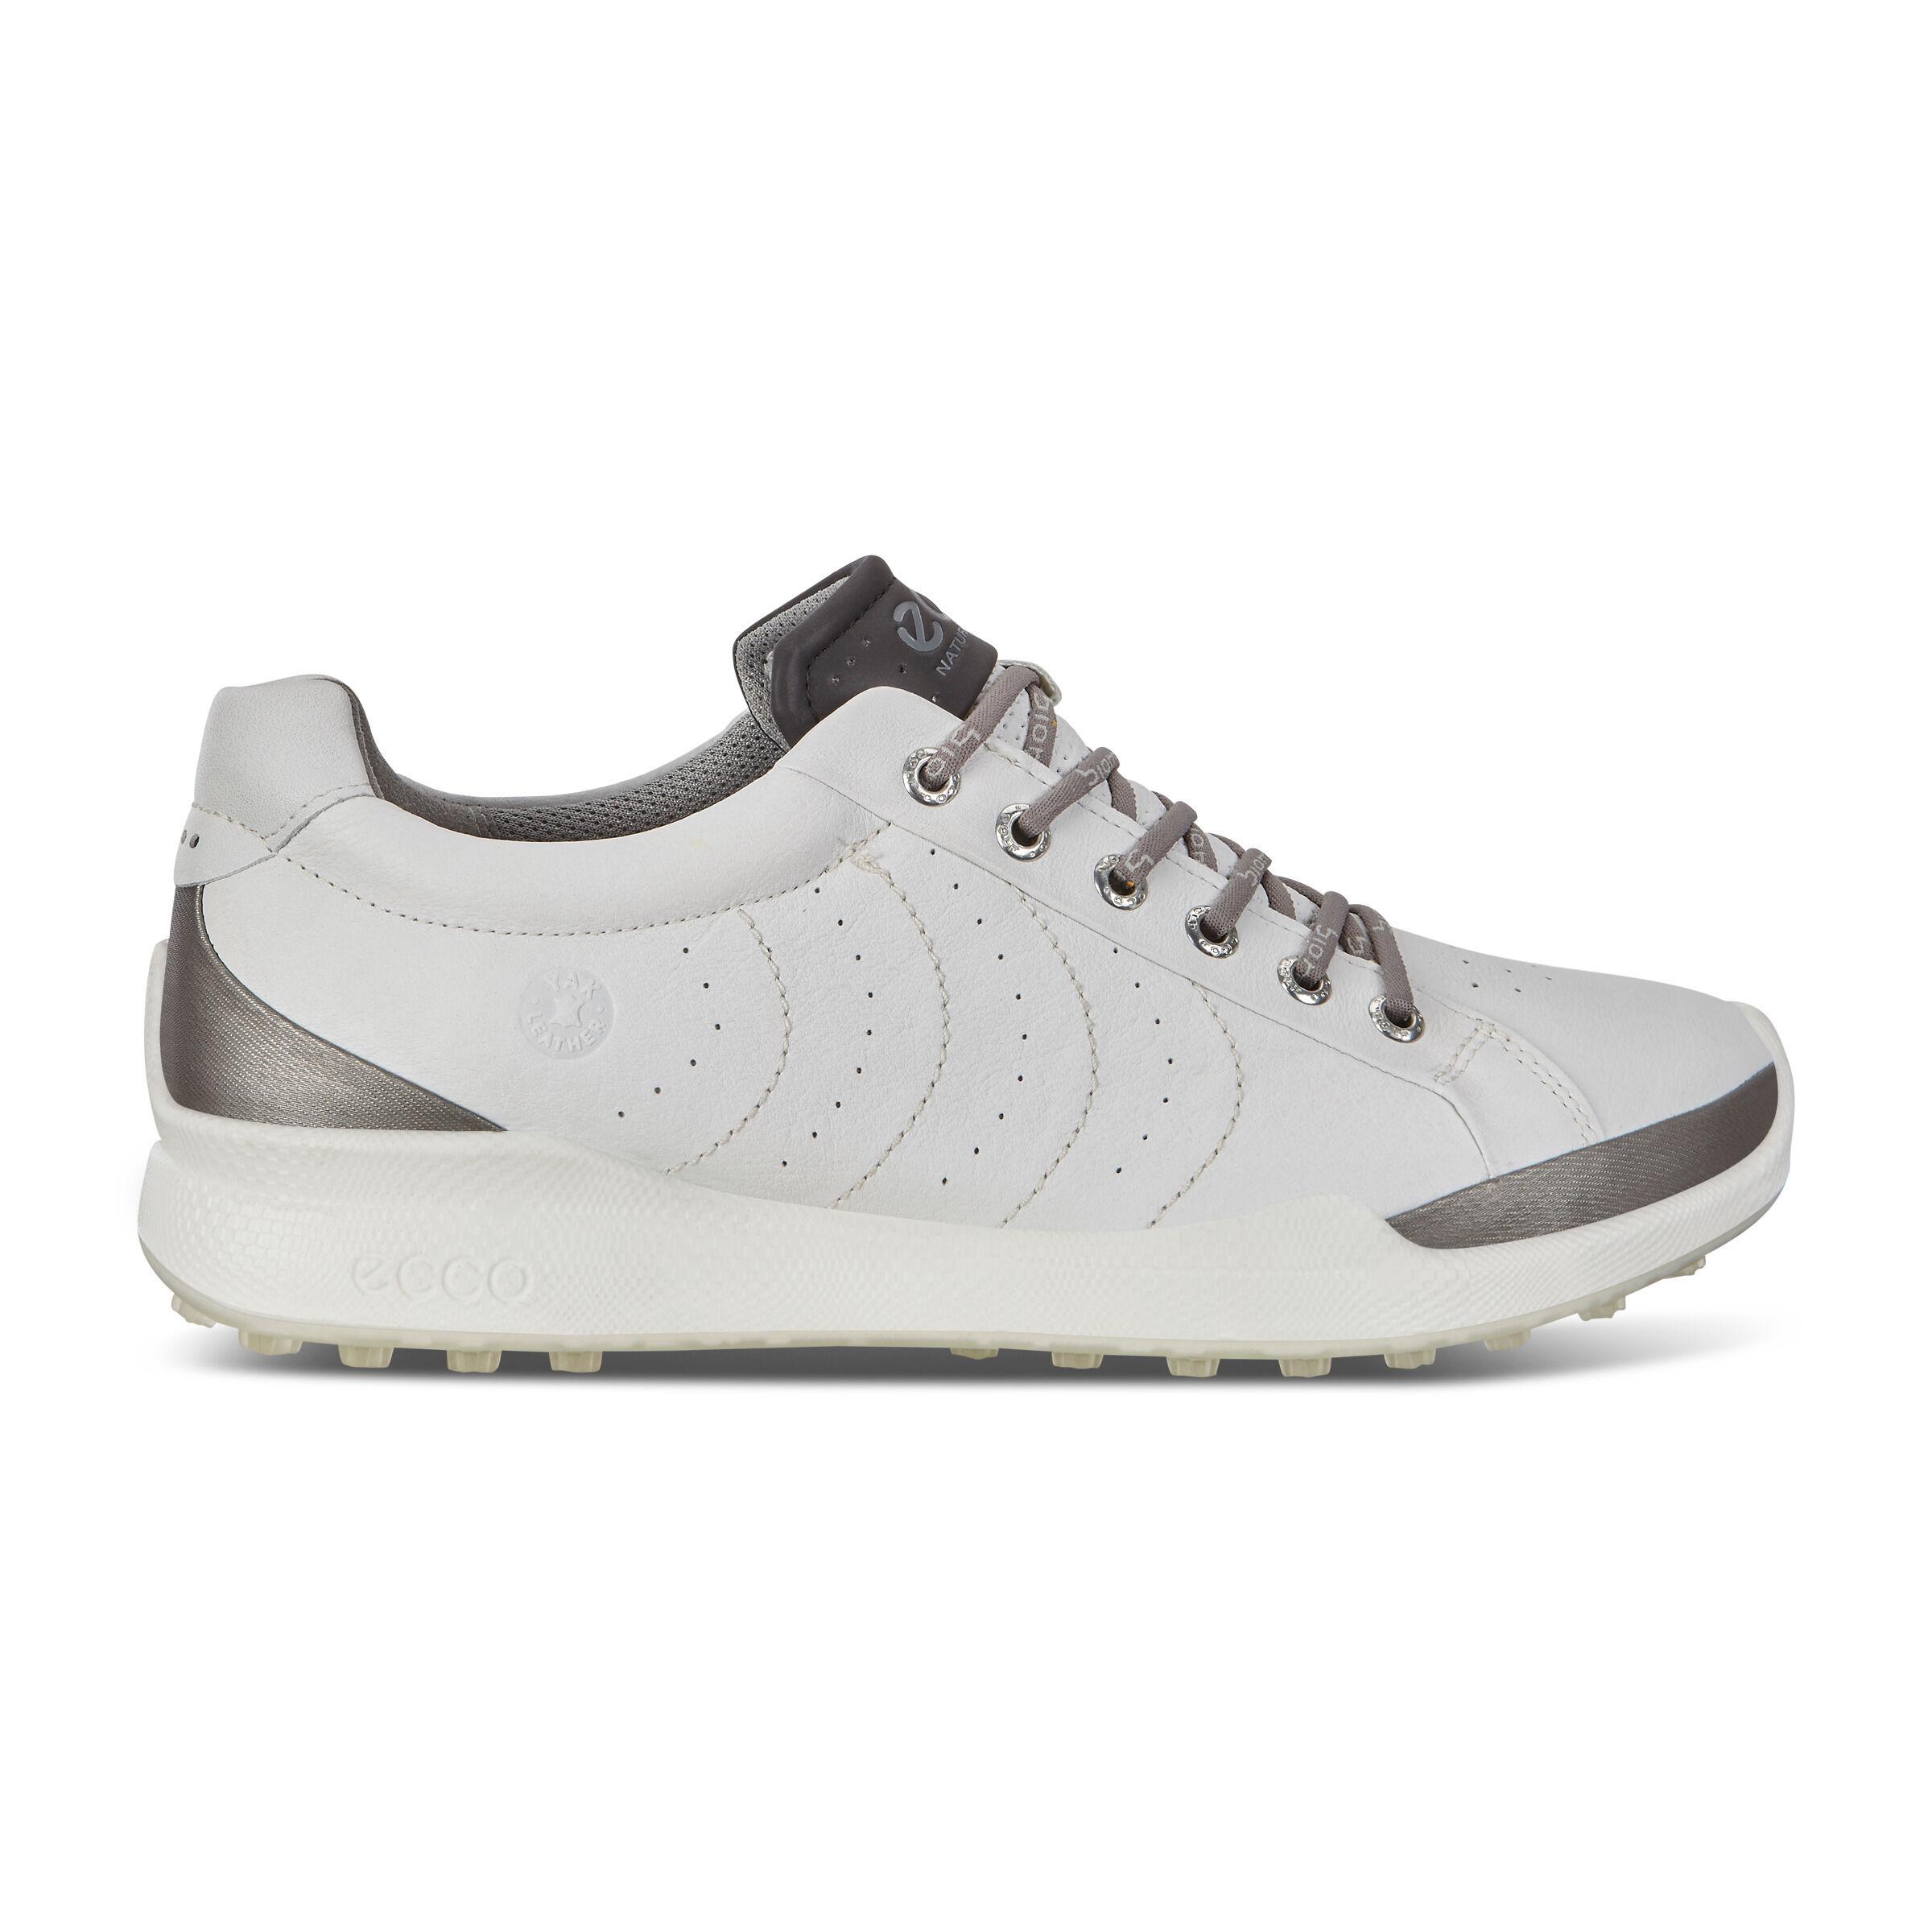 ecco mens golf shoes sale